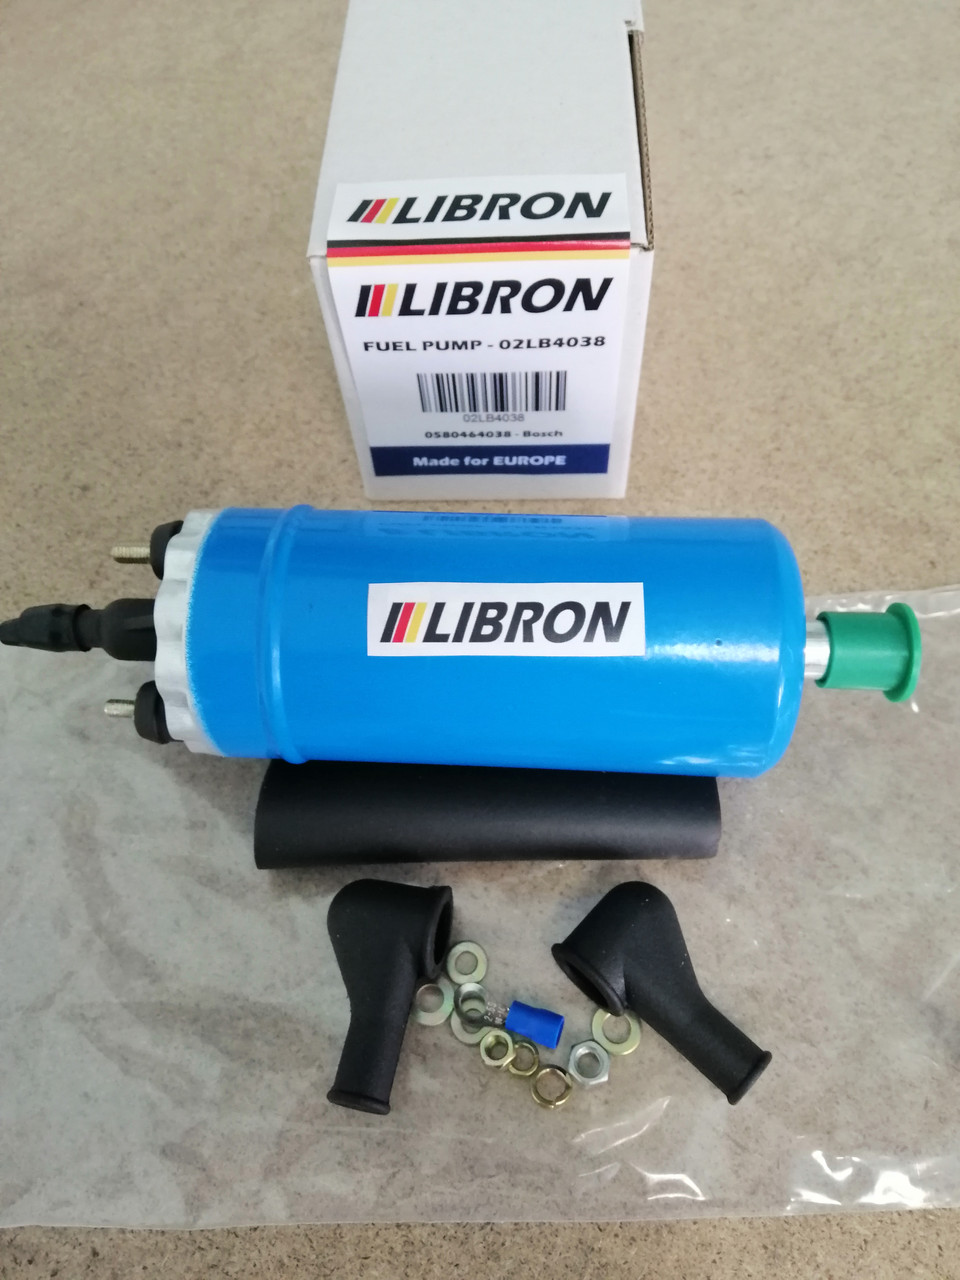 Топливный насос LIBRON 02LB4038 - BMW 7 (E23) 745 i (1980-1983)